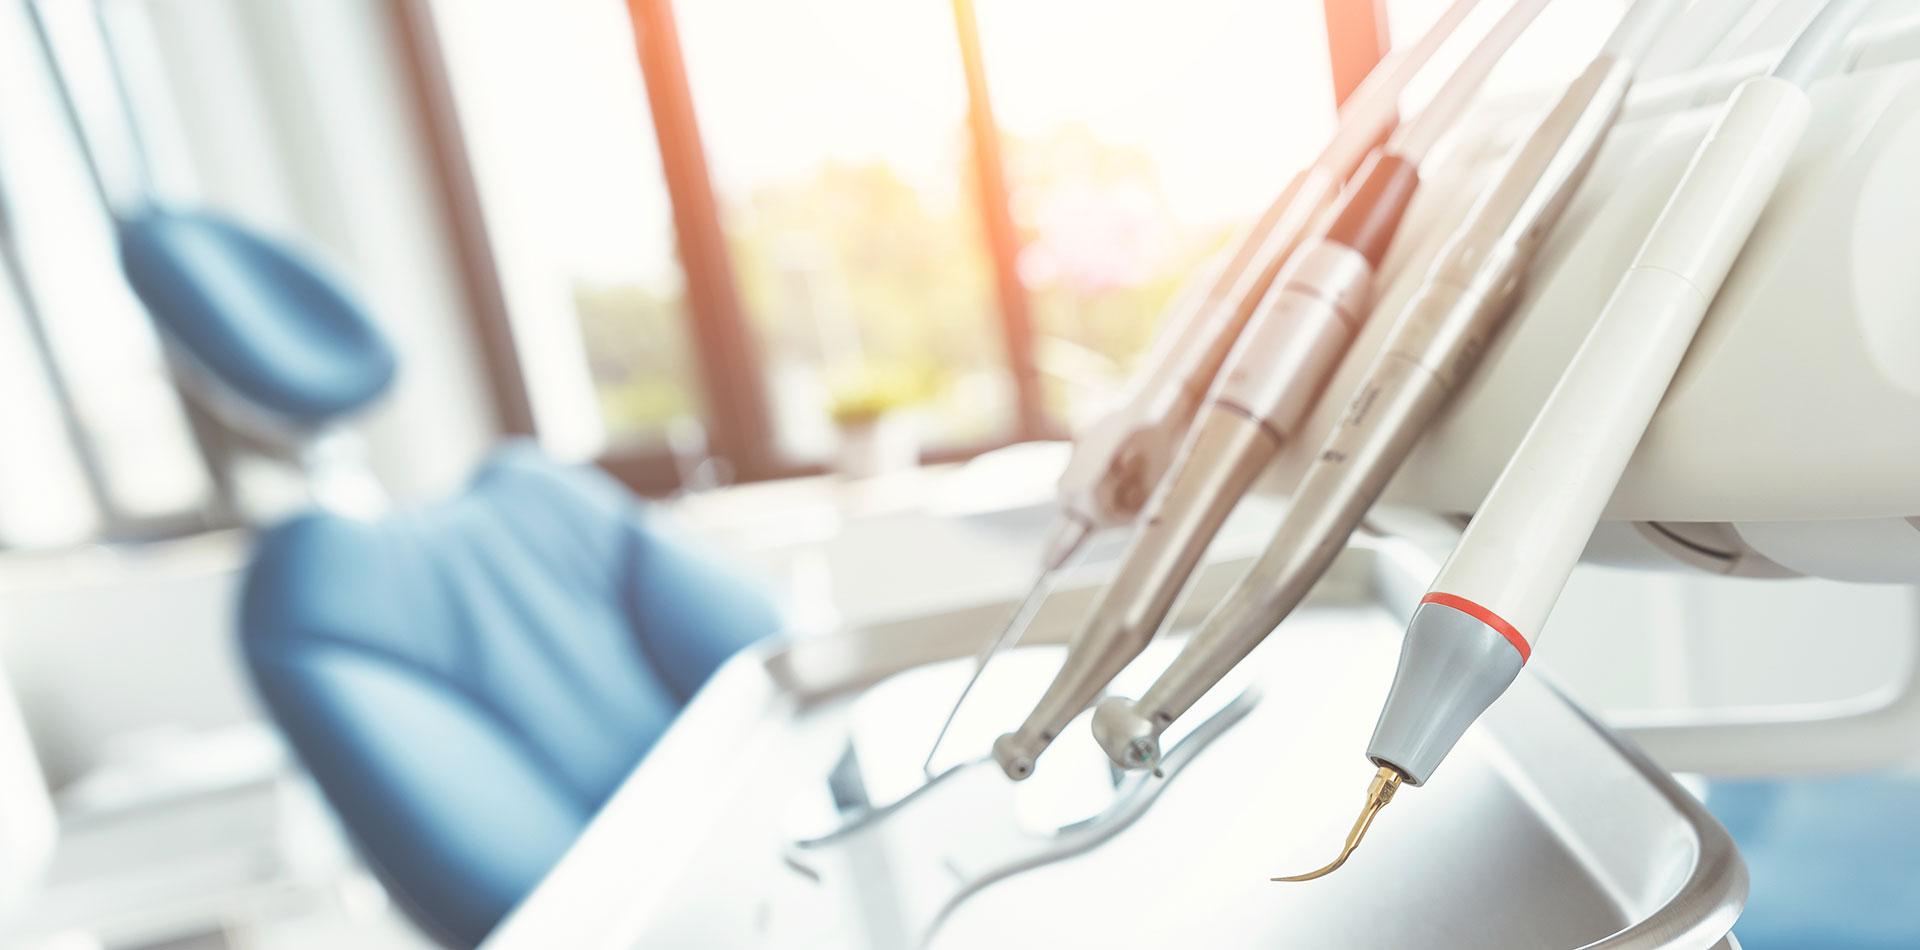 Kalkberg Zahnärzte Bad Segeberg Chirurgie